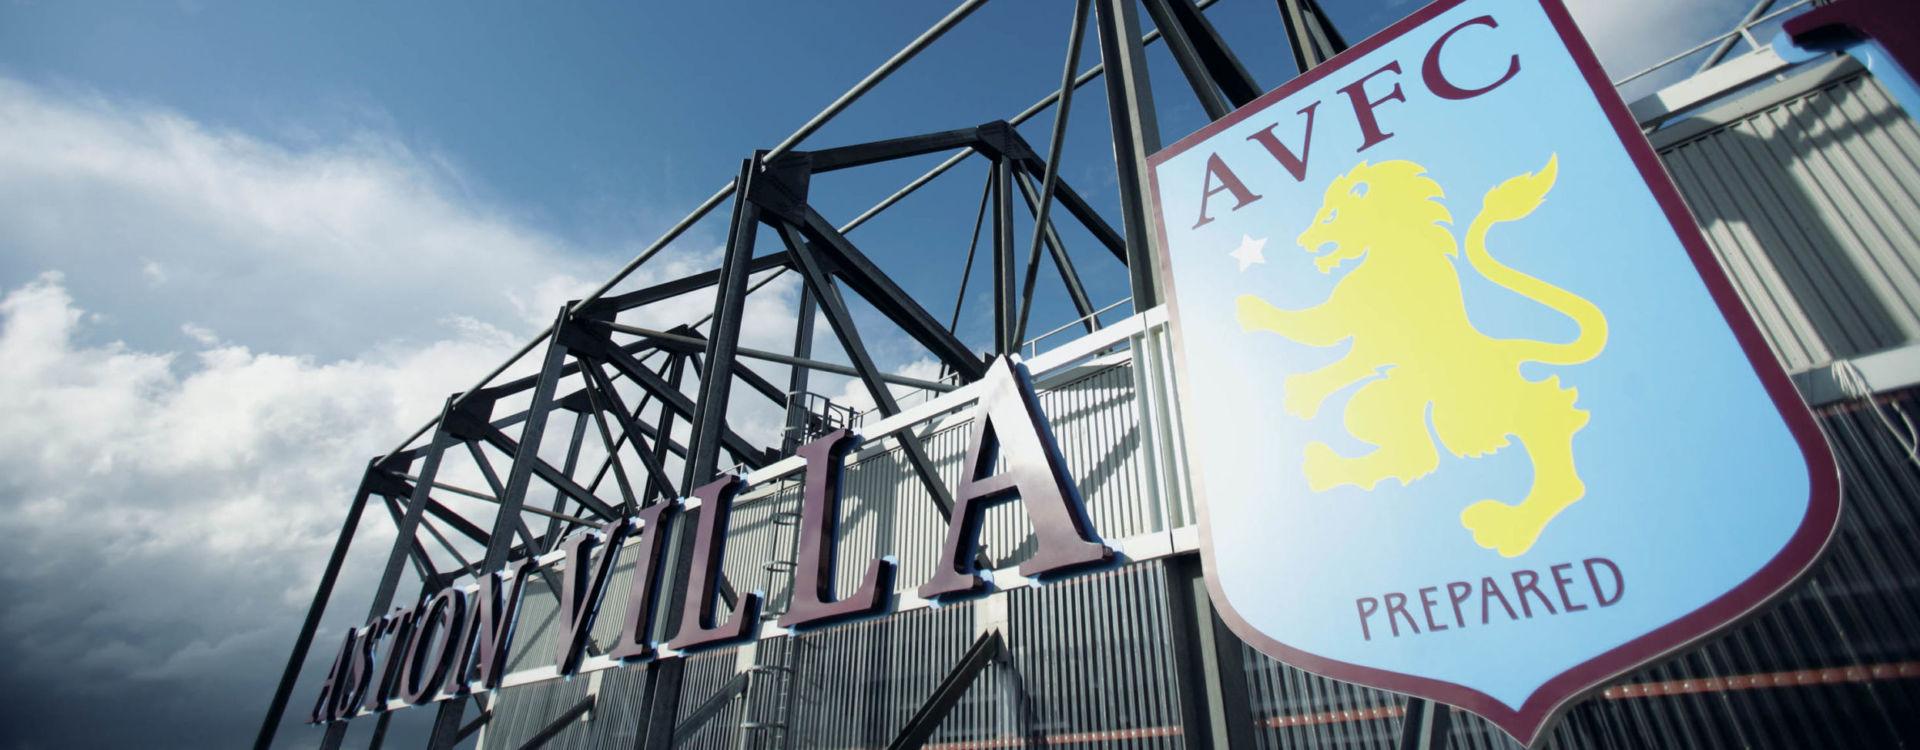 Aston Villa Hospitality